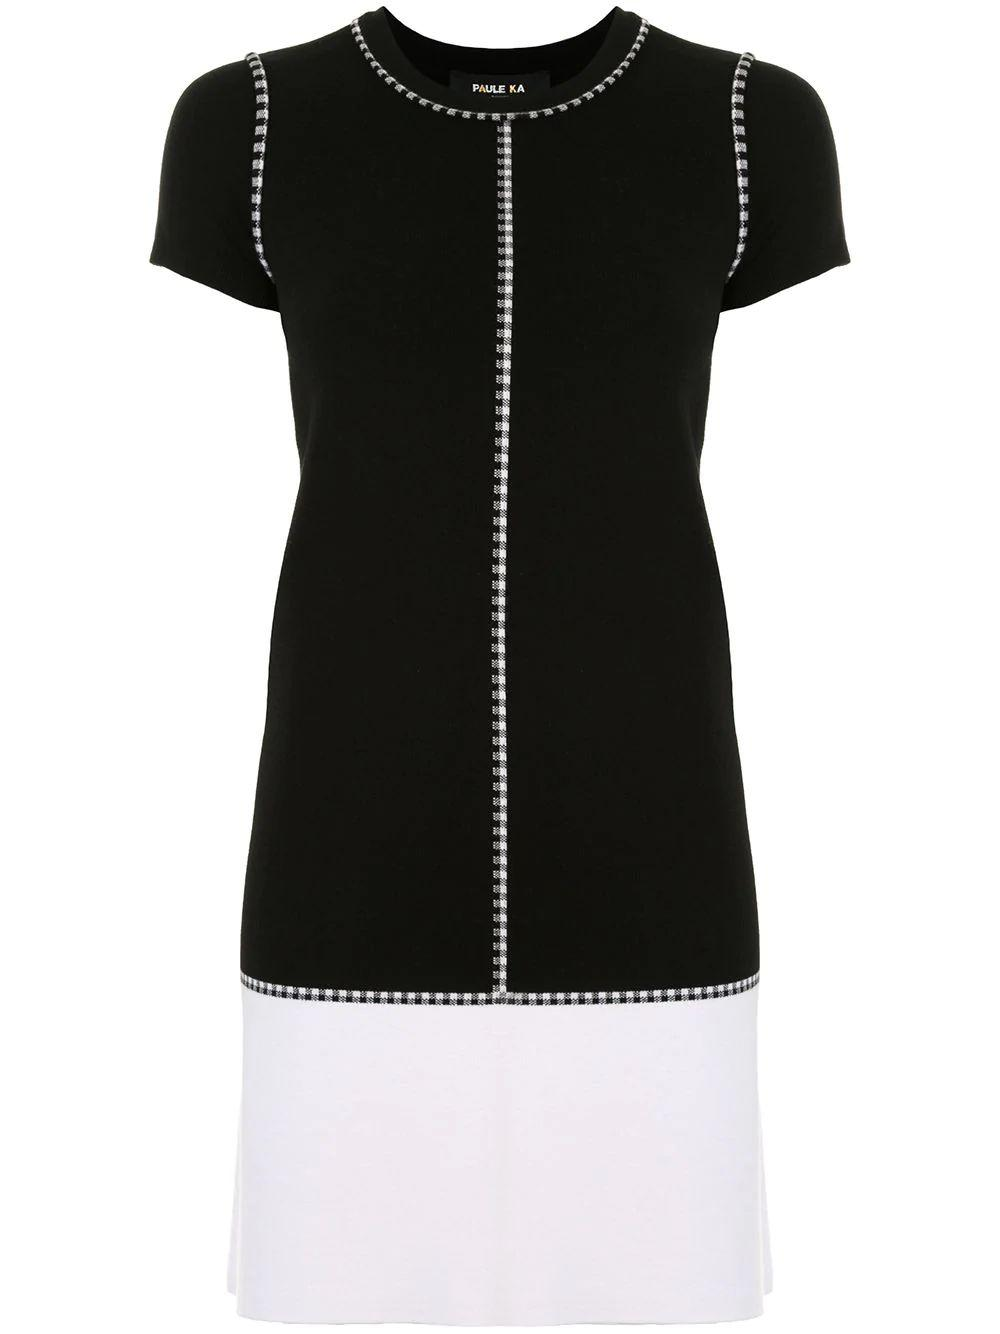 Two- Tone Knit Dress Item # 403/RO32